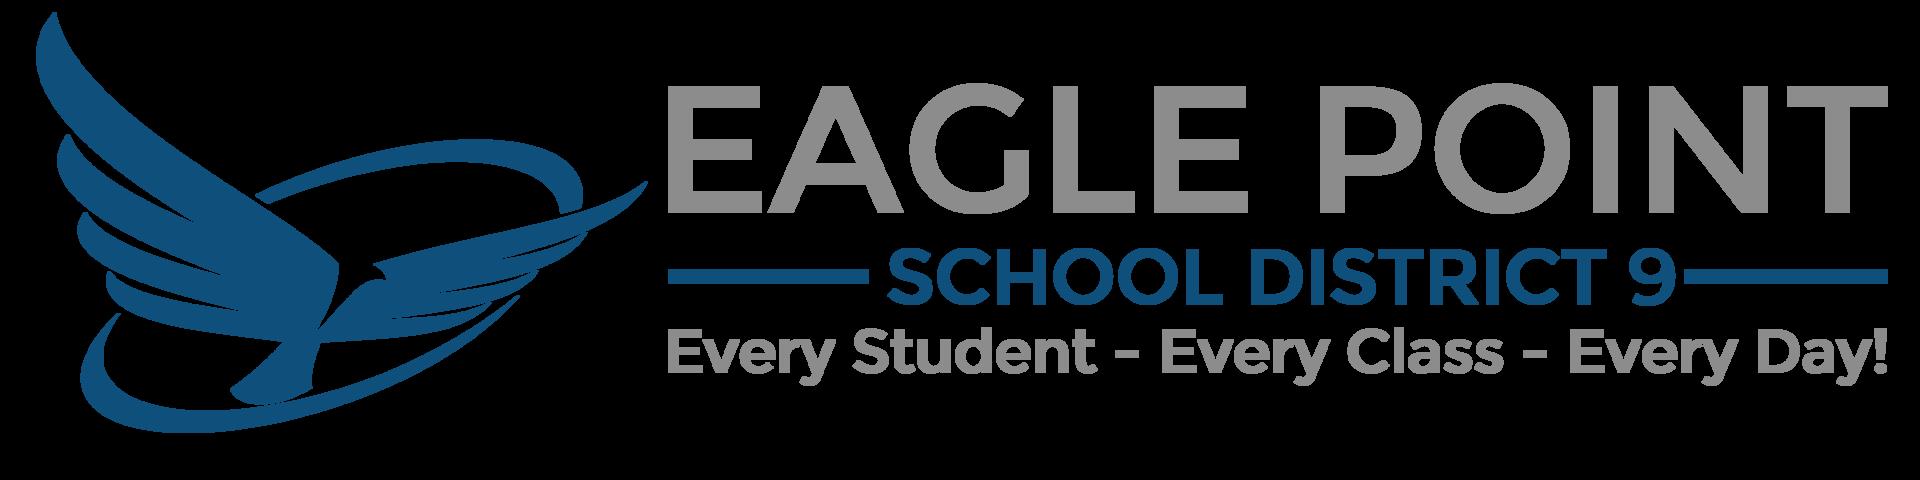 Eagle Point School District 9